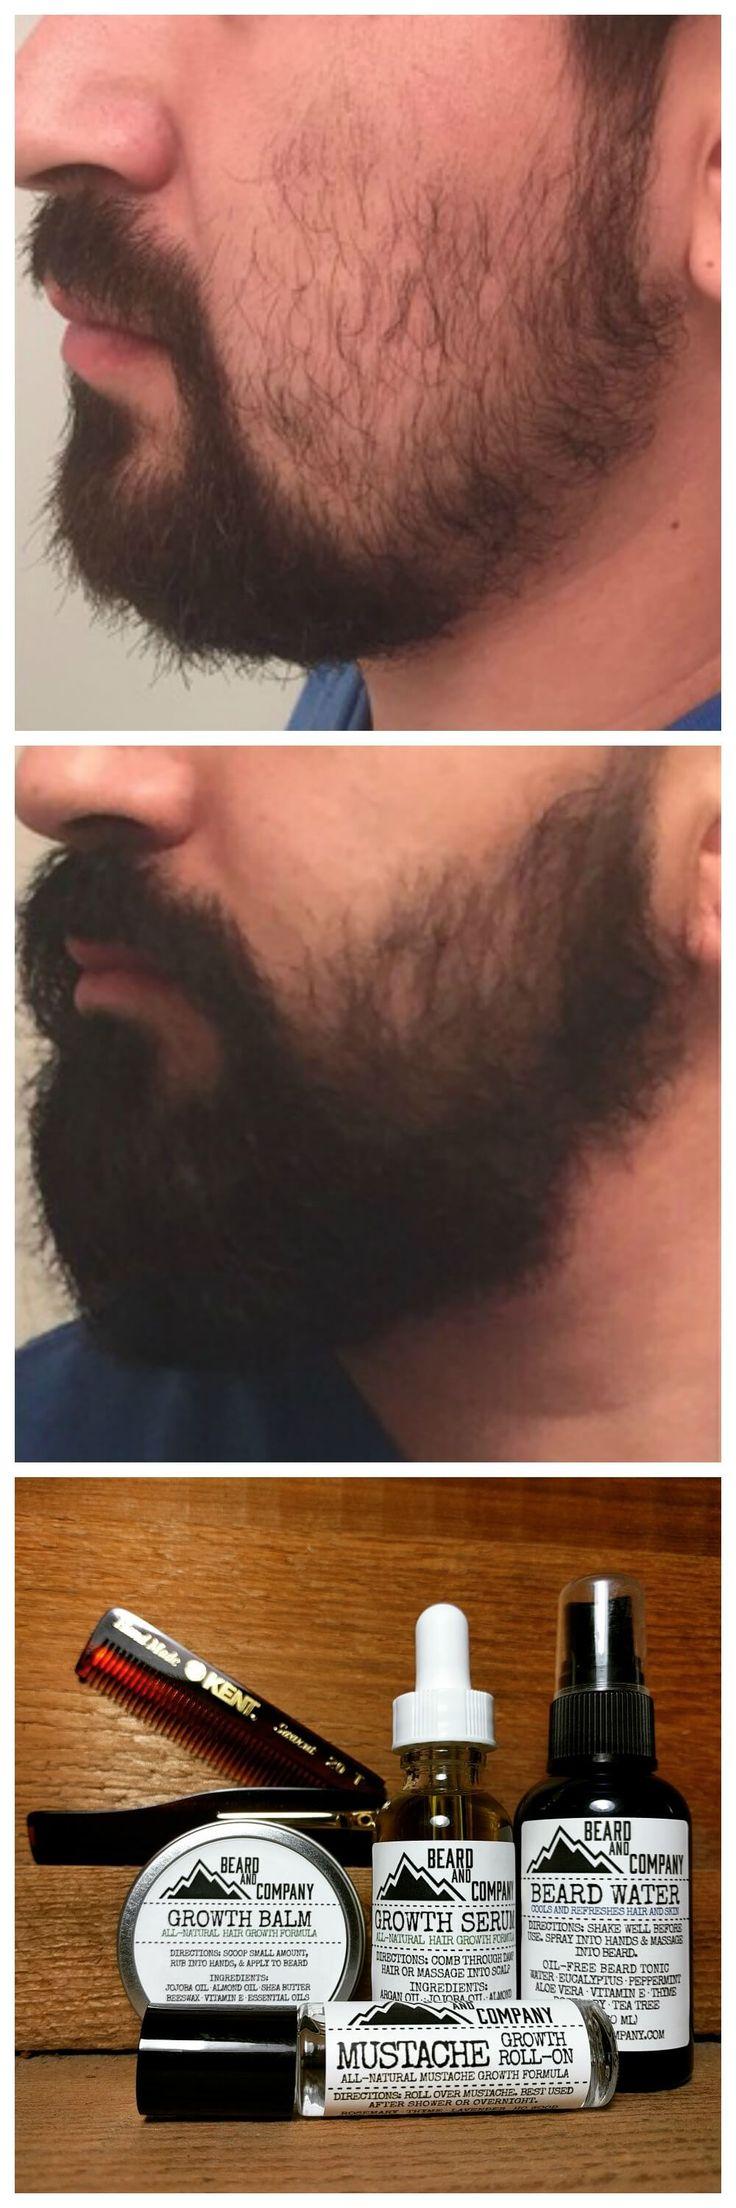 Peachy 17 Best Ideas About Beard Styles On Pinterest Beards Just For Short Hairstyles For Black Women Fulllsitofus